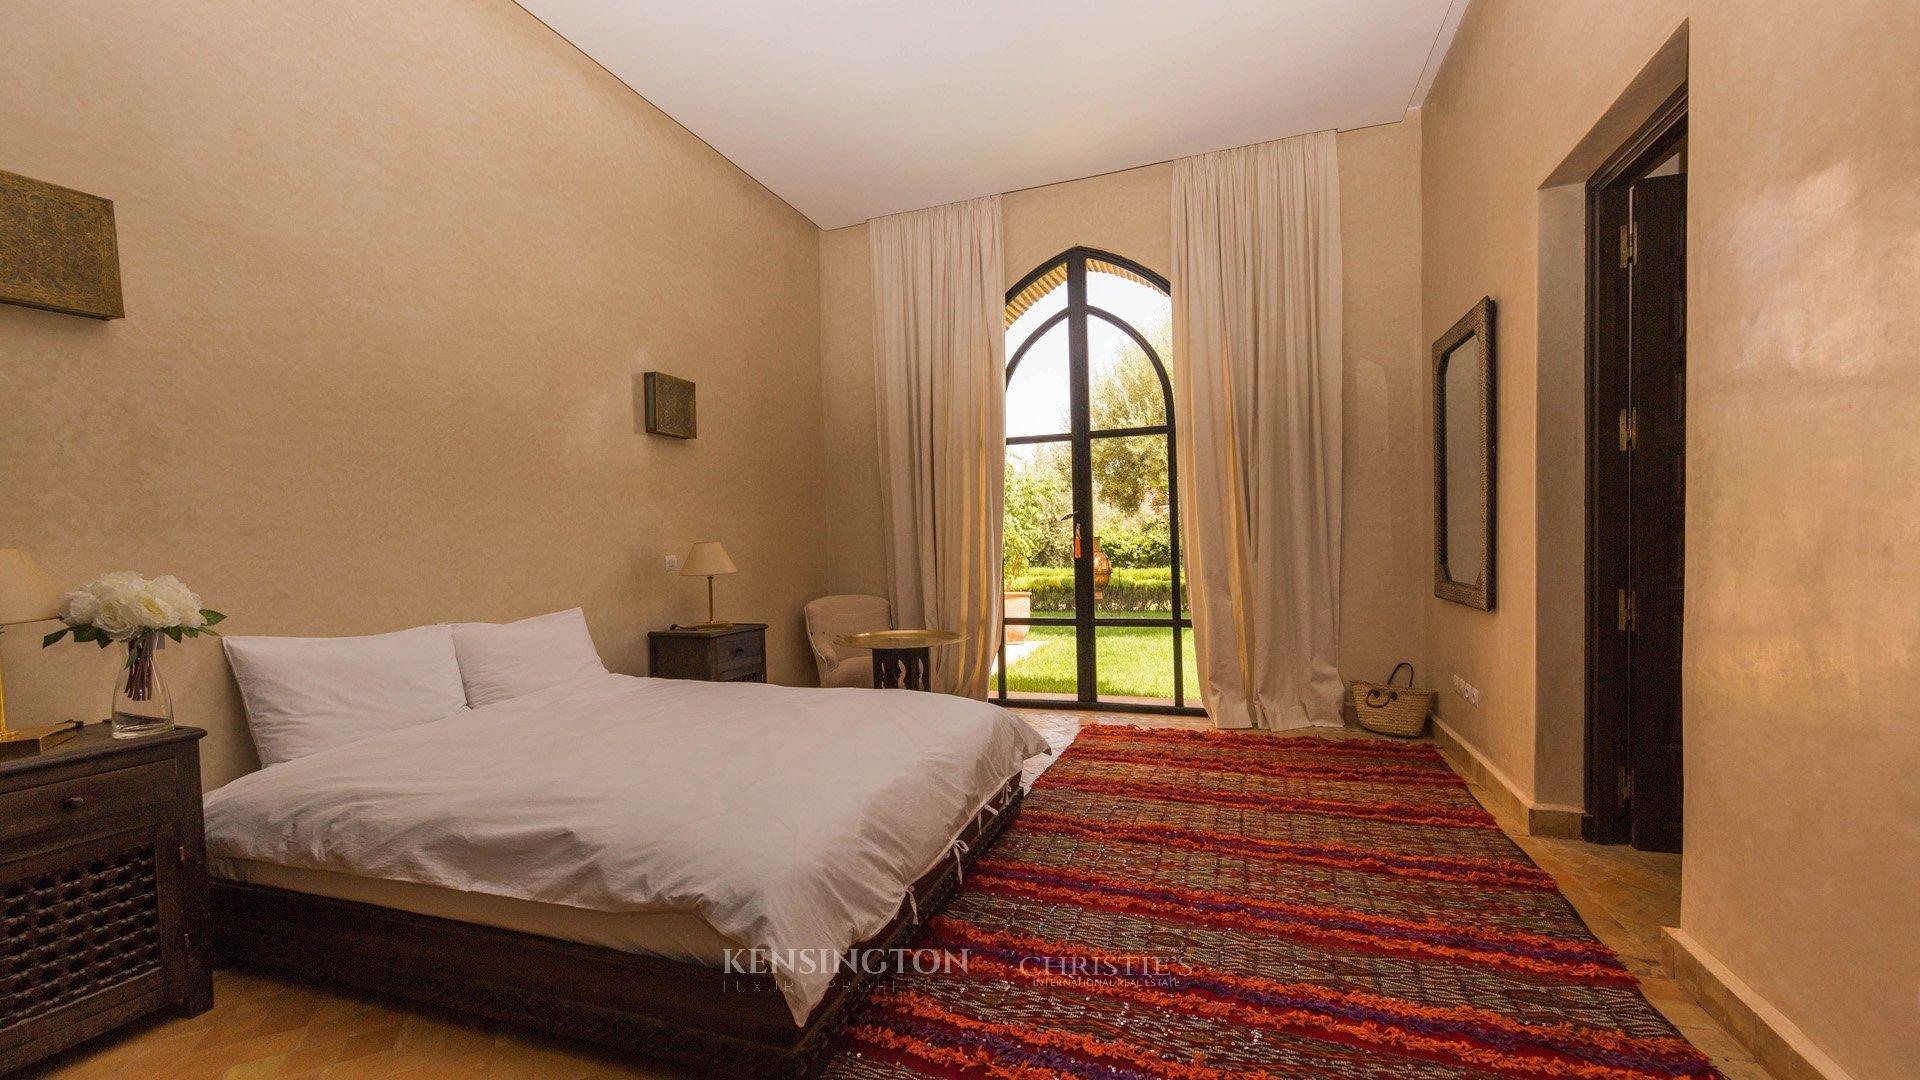 KPPM00853: Villa Anahita Luxury Villa Marrakech Morocco